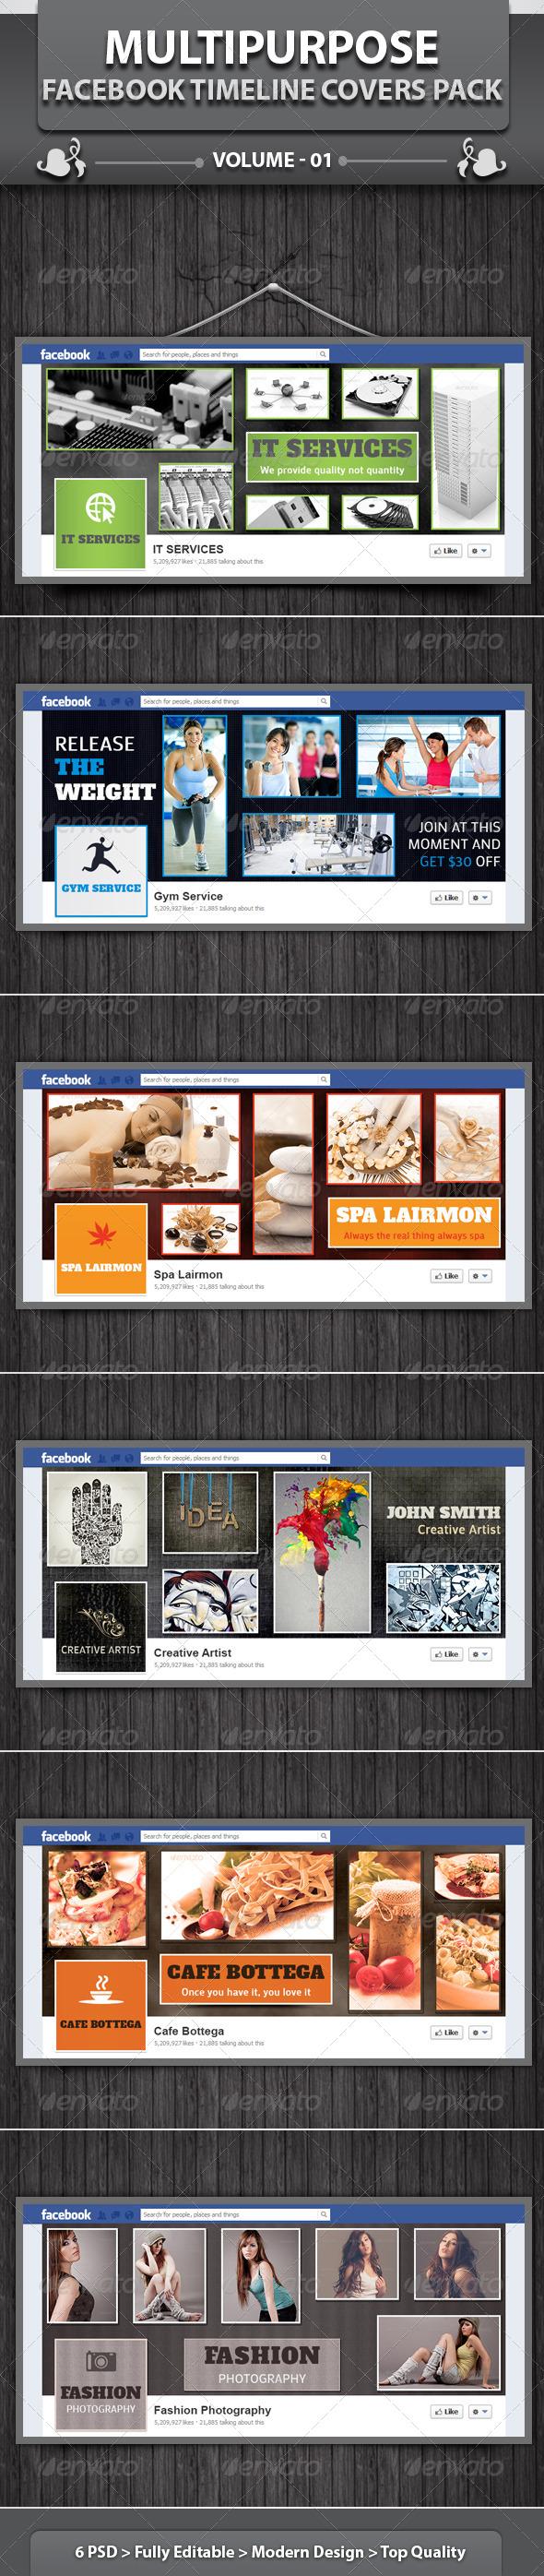 GraphicRiver Multipurpose Facebook Timeline Covers Pack v1 4505459